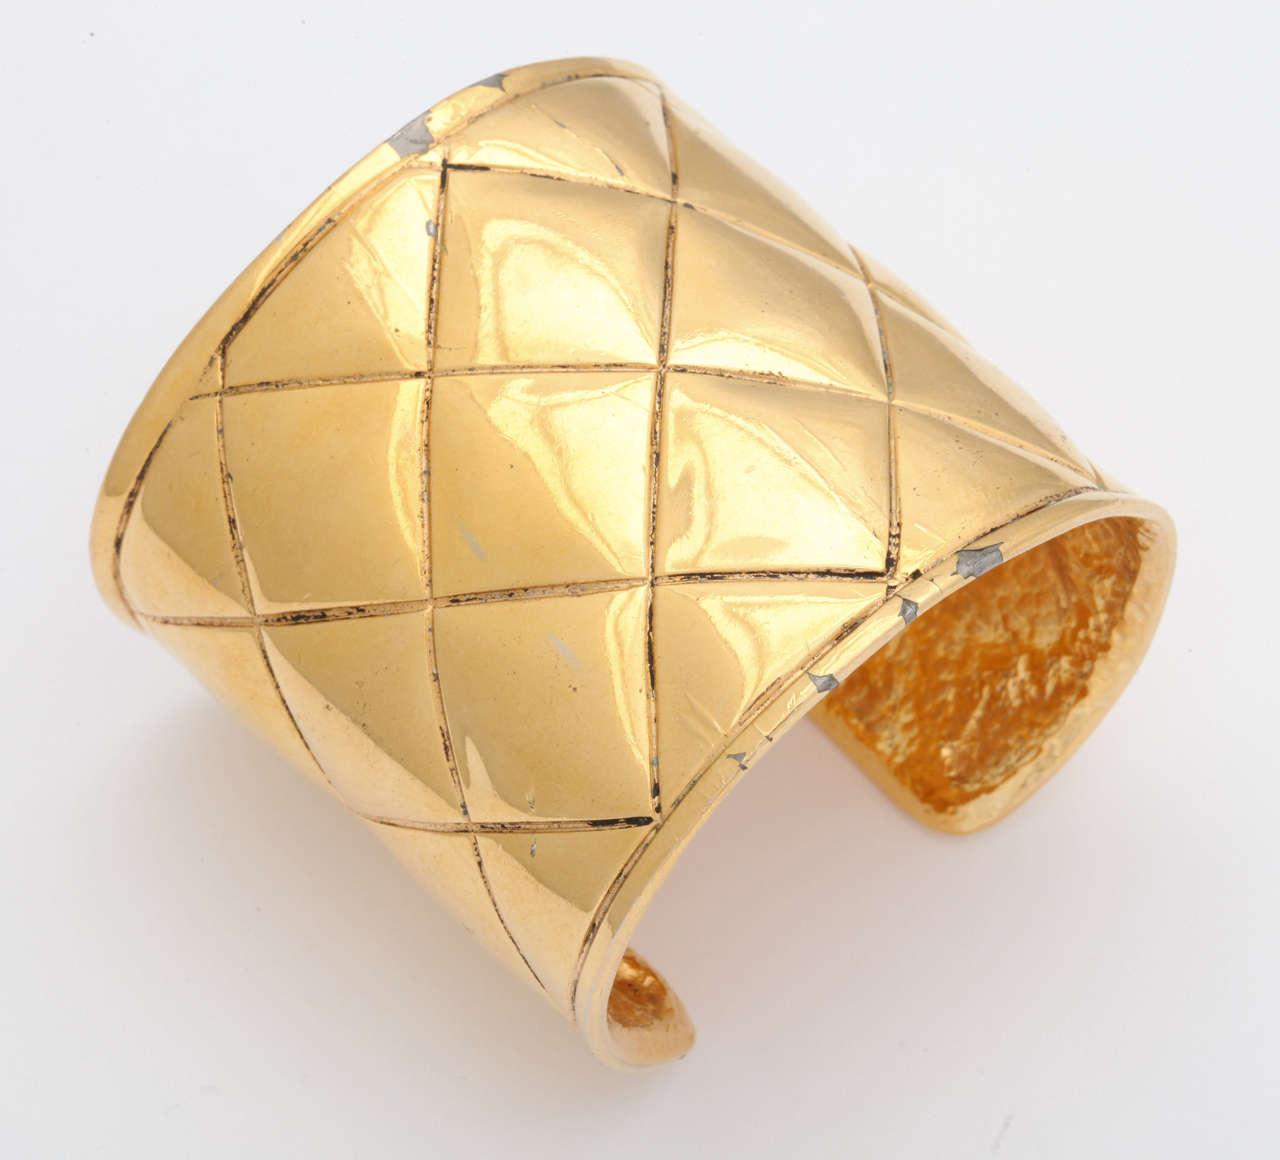 Chanel Quilted Bangle Bracelet 2